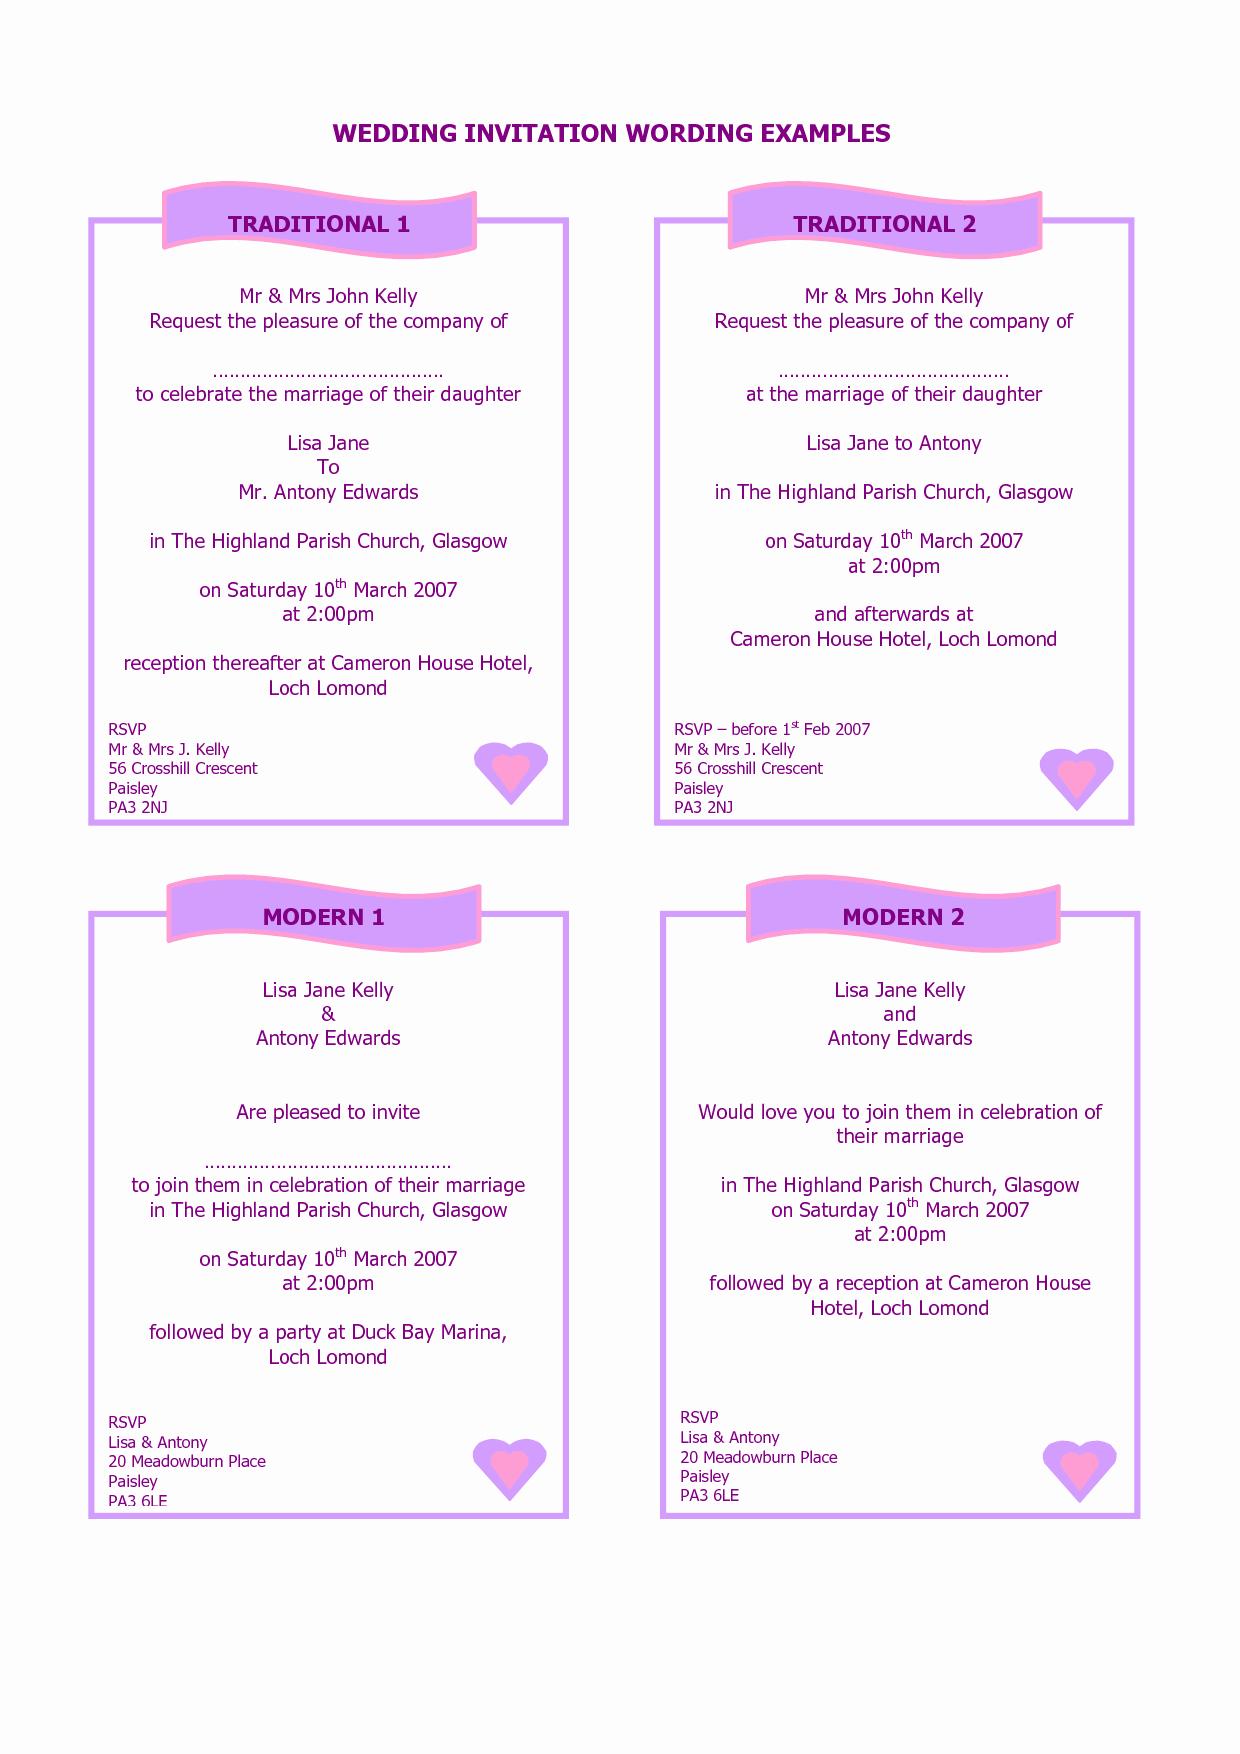 Wedding Reception Invitation Wording Samples New Wedding Invitation Creative Wedding Invitation Wording